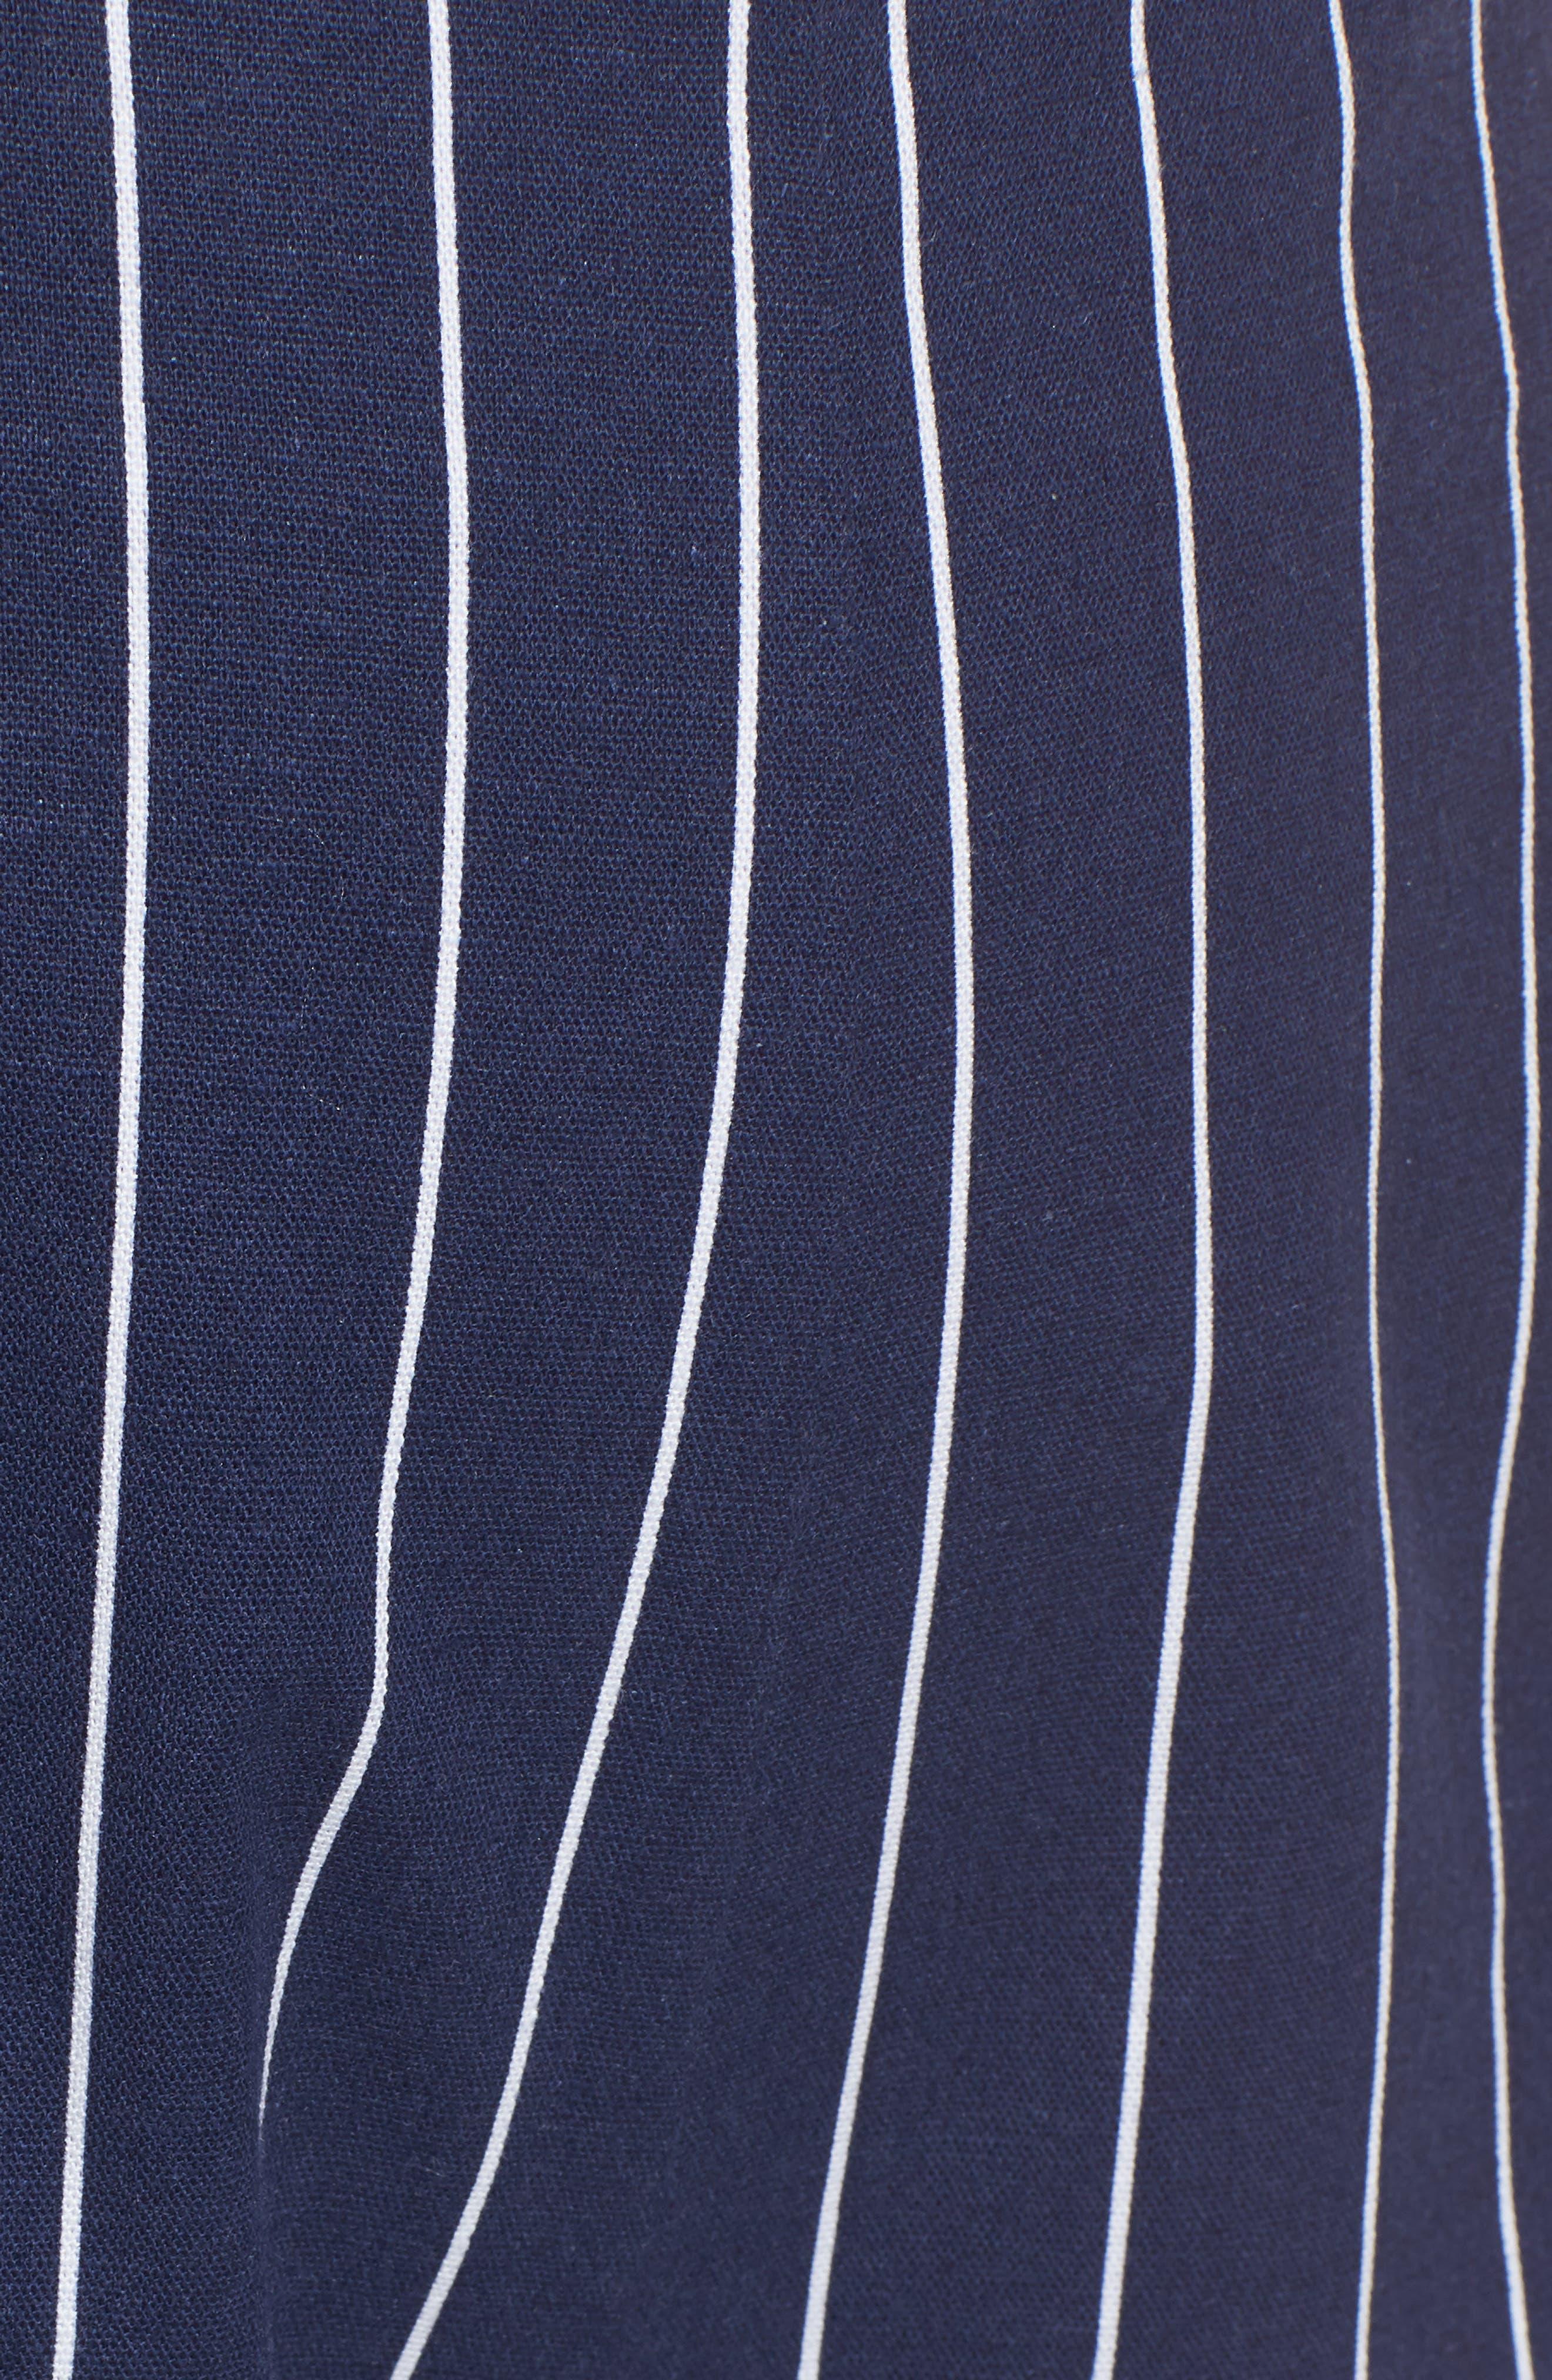 WAYF, Pisa High Waist Crop Pants, Alternate thumbnail 6, color, 400